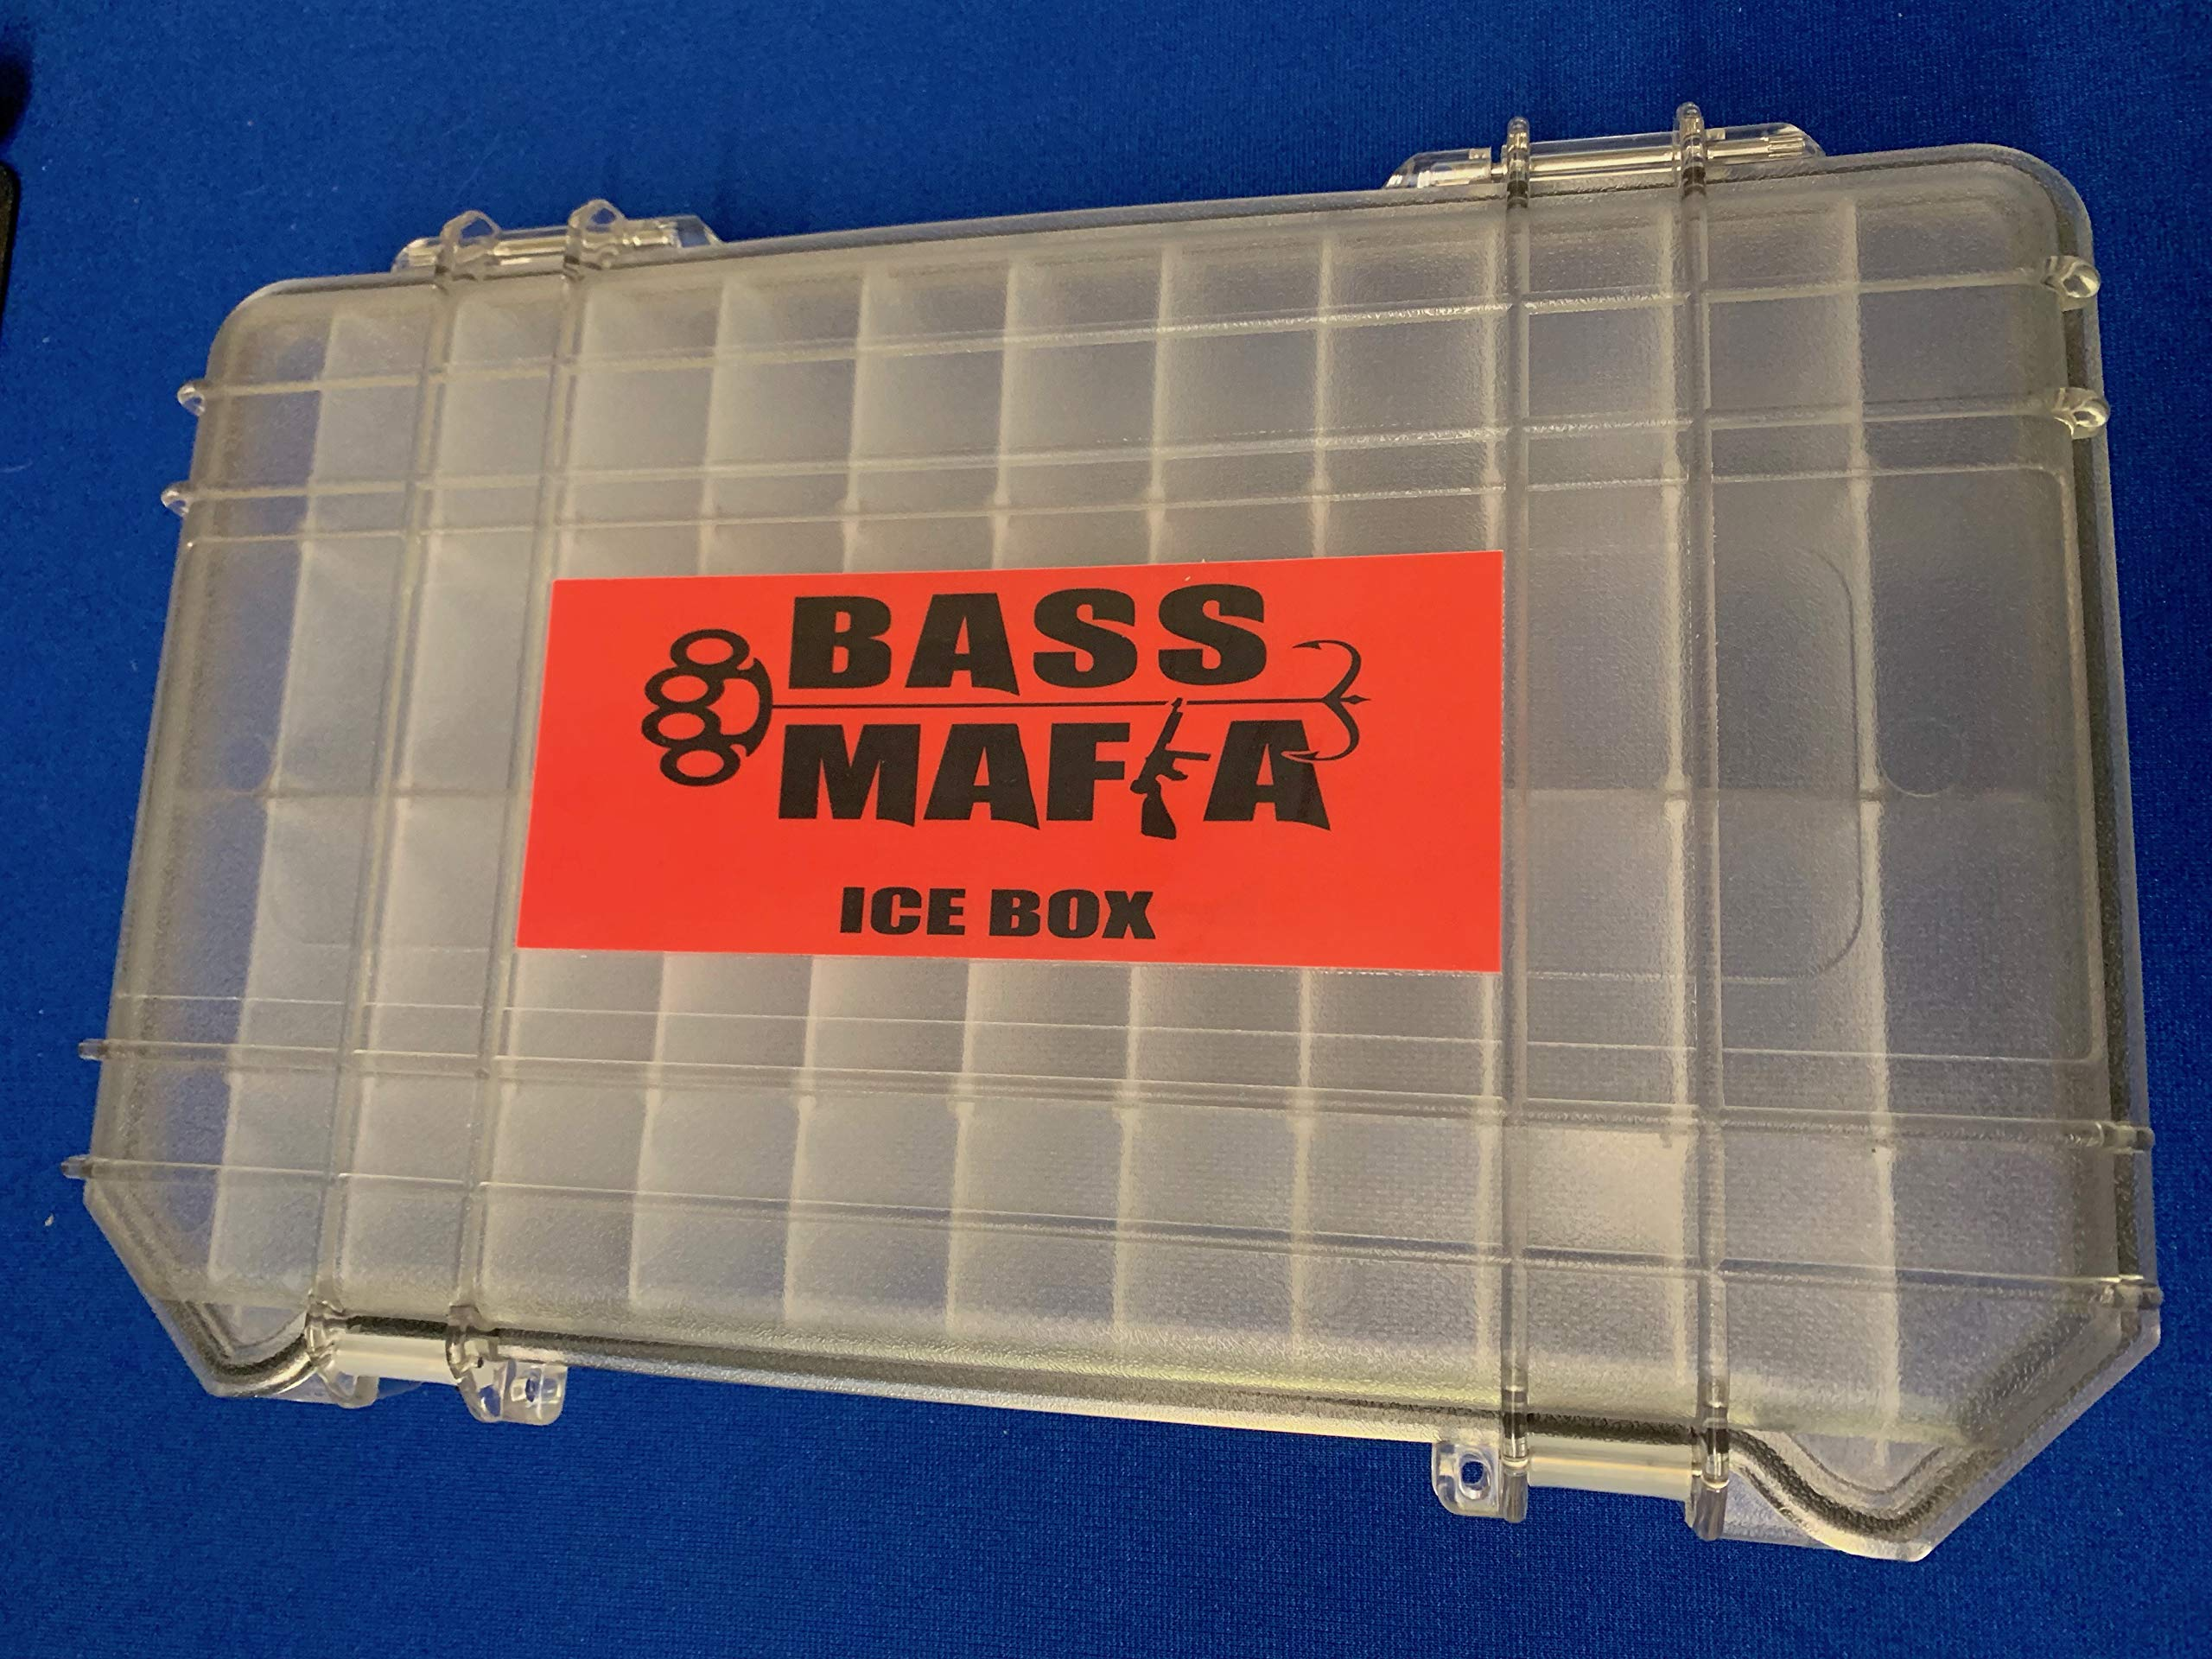 Bass Mafia ICEBOX 3700 by Ice Box